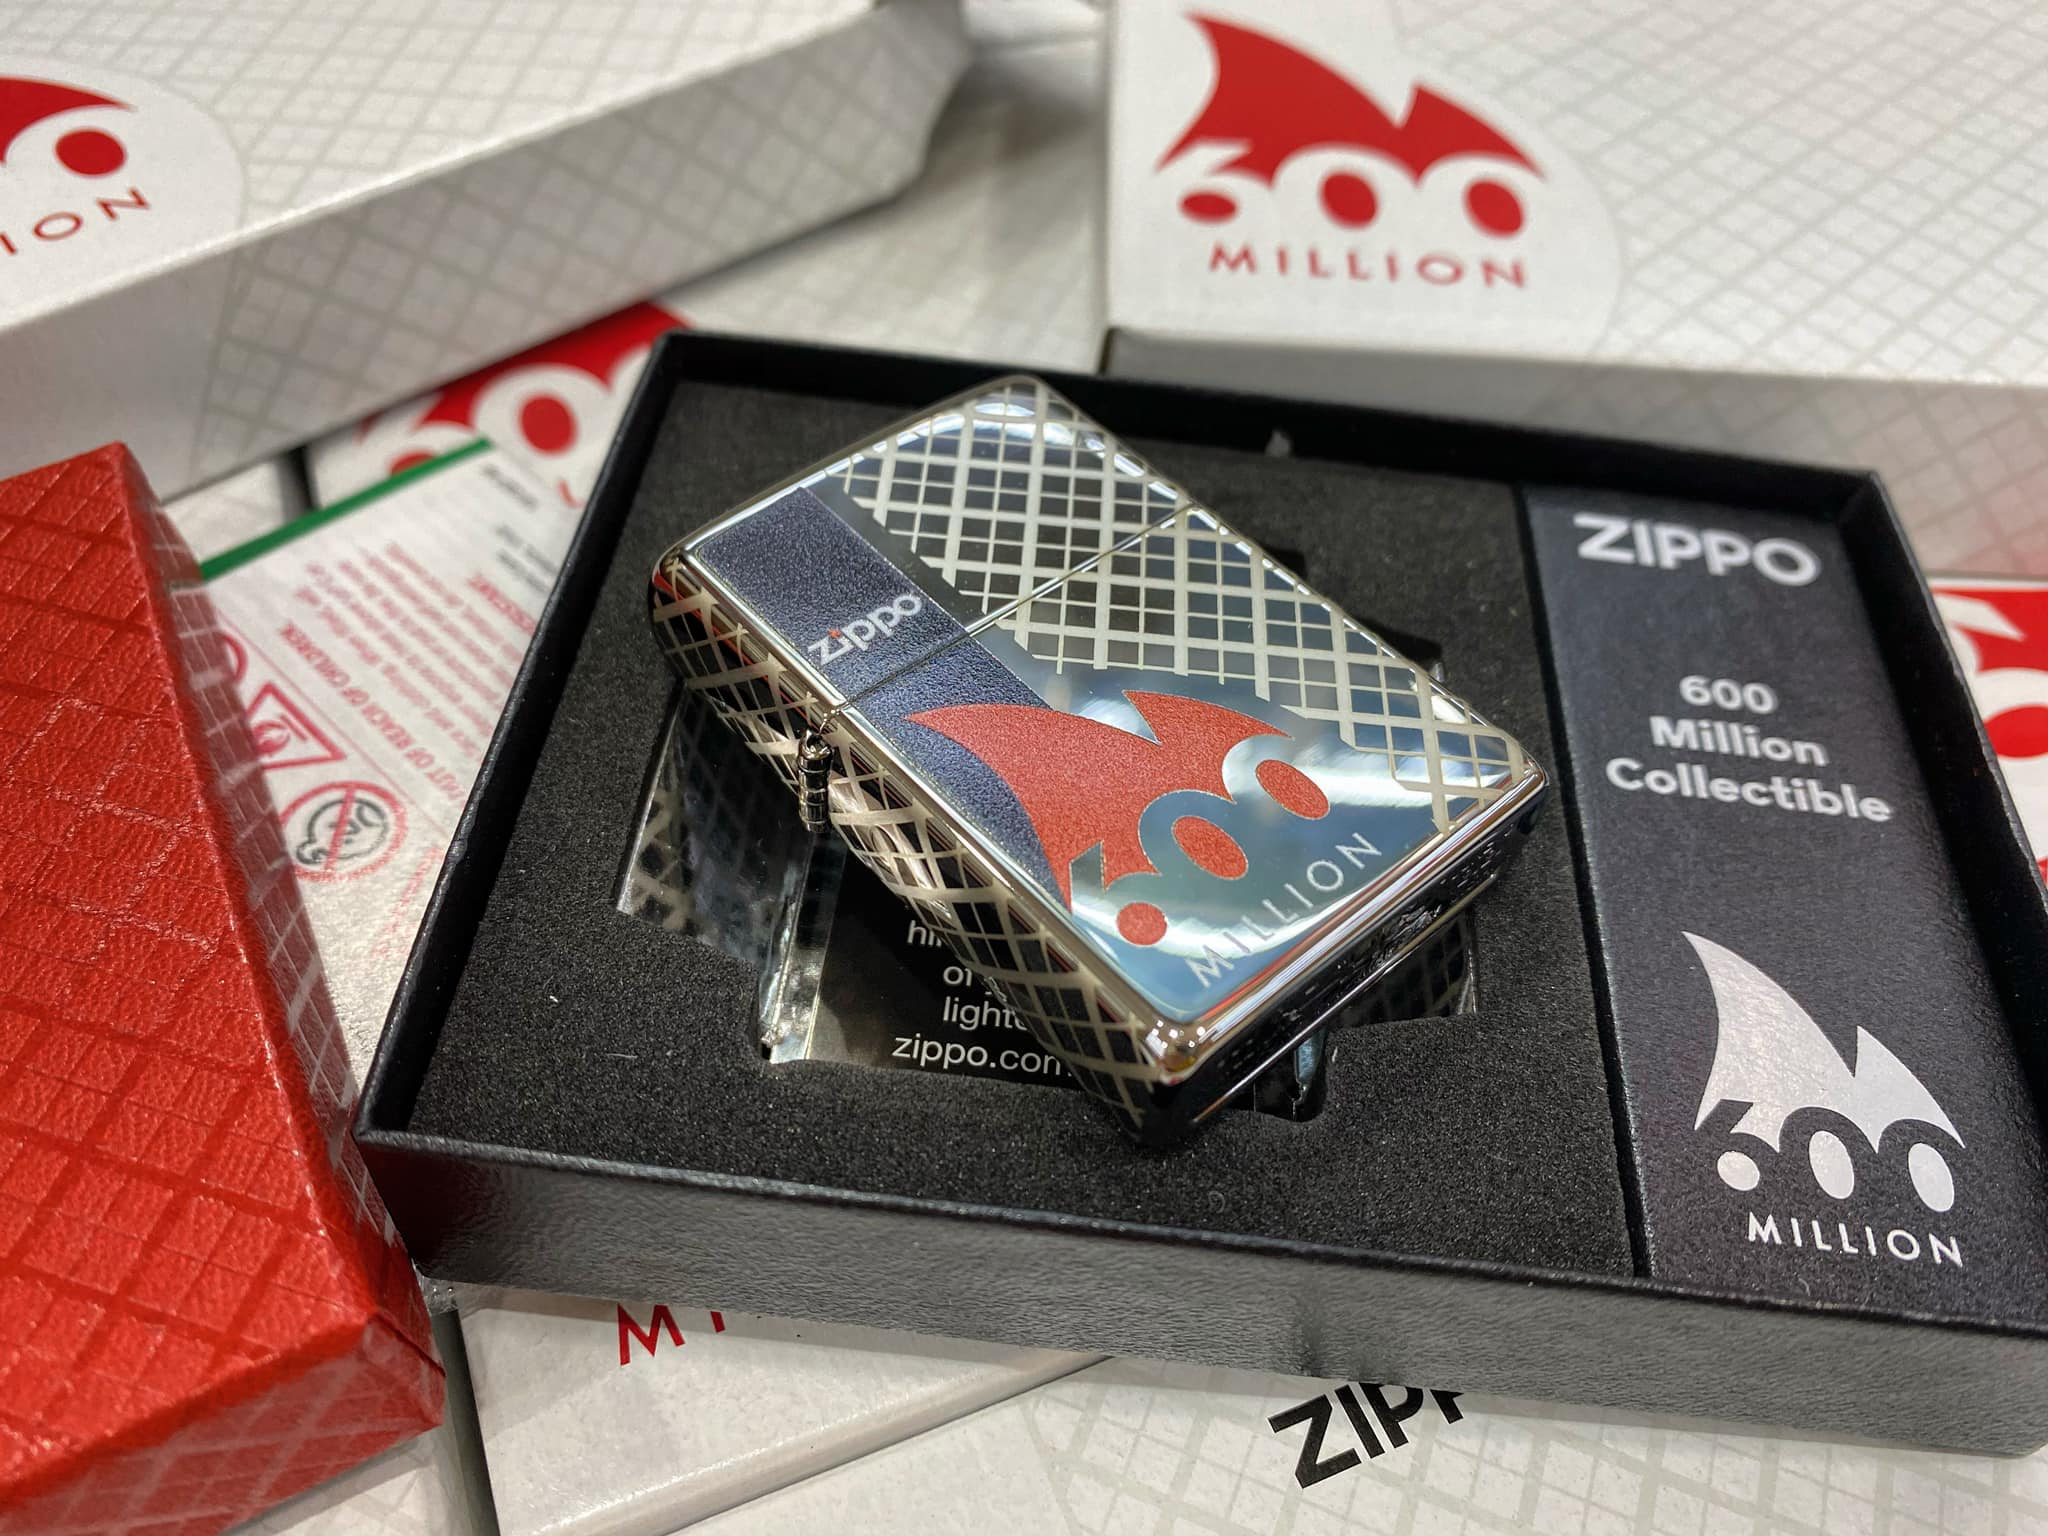 Zippo 600 Millionth Collectible - Zippo 49272 4